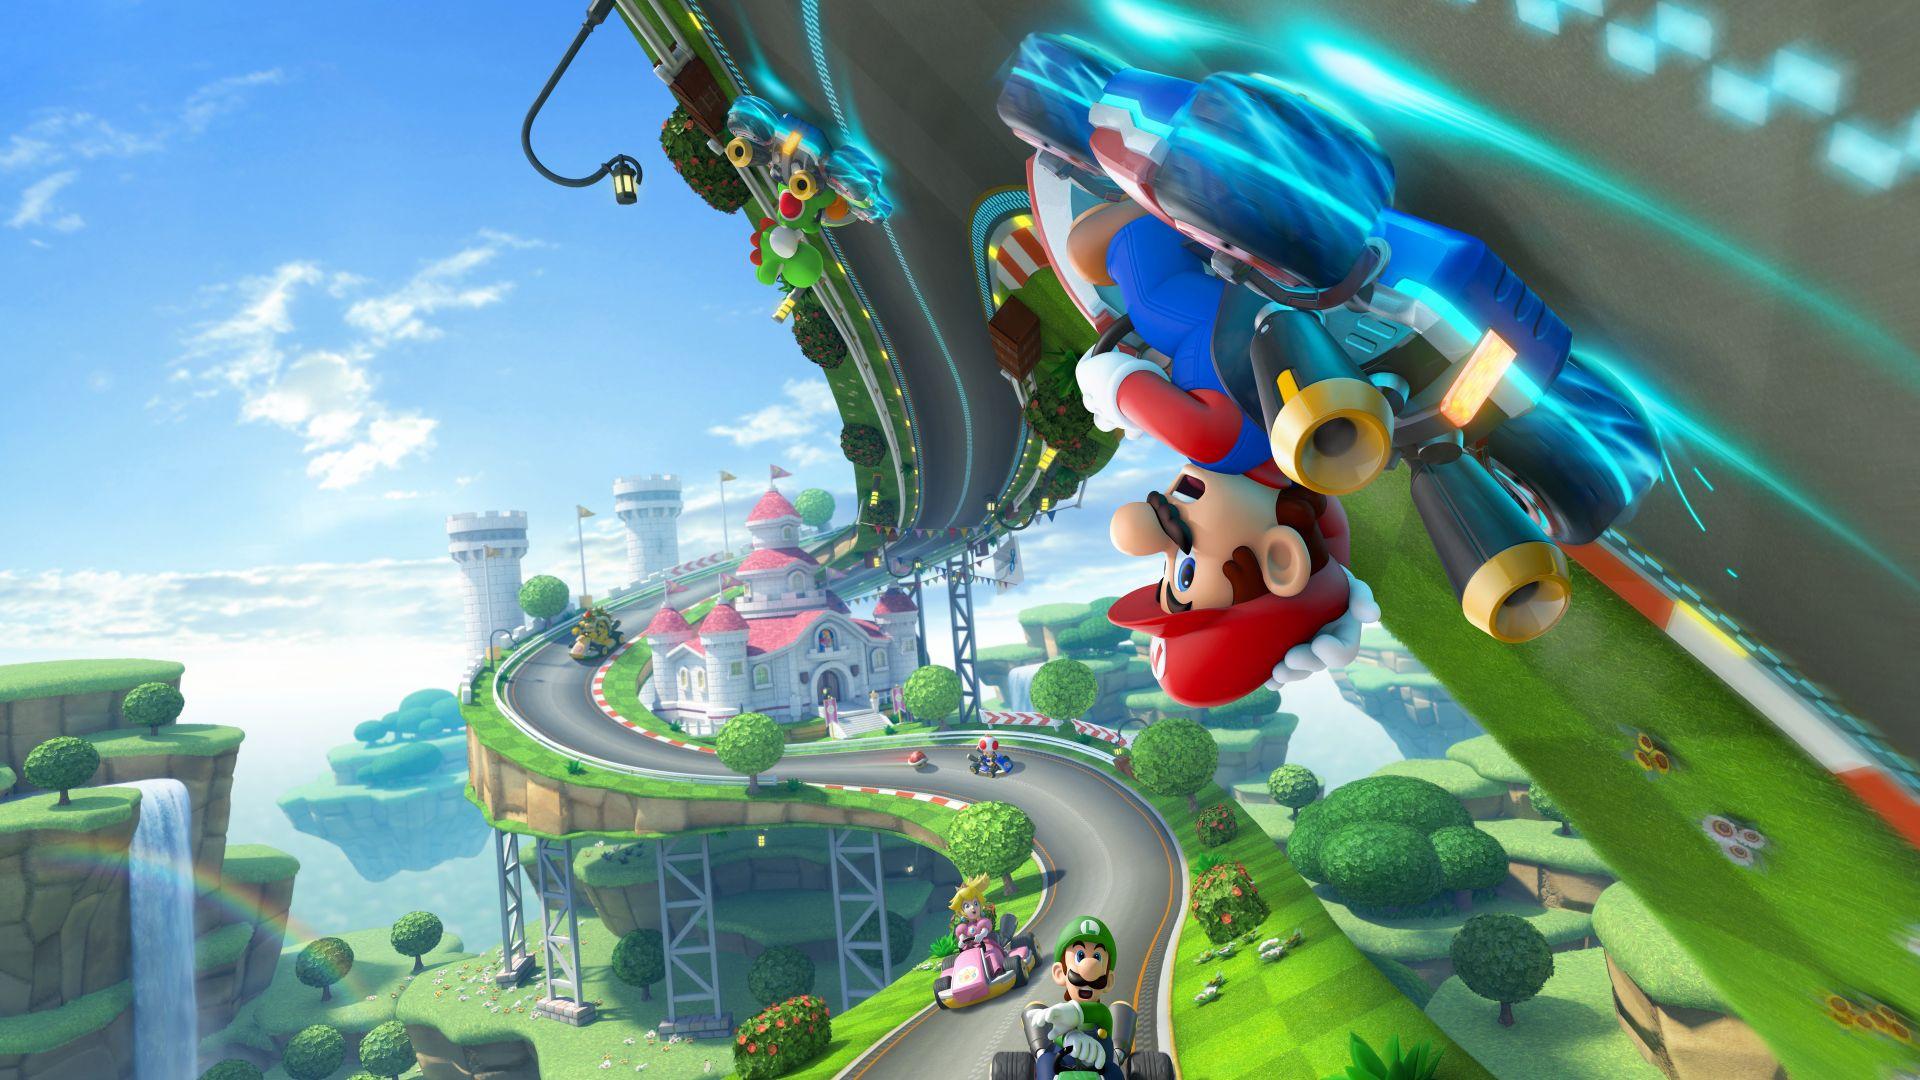 Desktop Wallpaper Mario Kart 8 Video Game Gaming 4k Hd